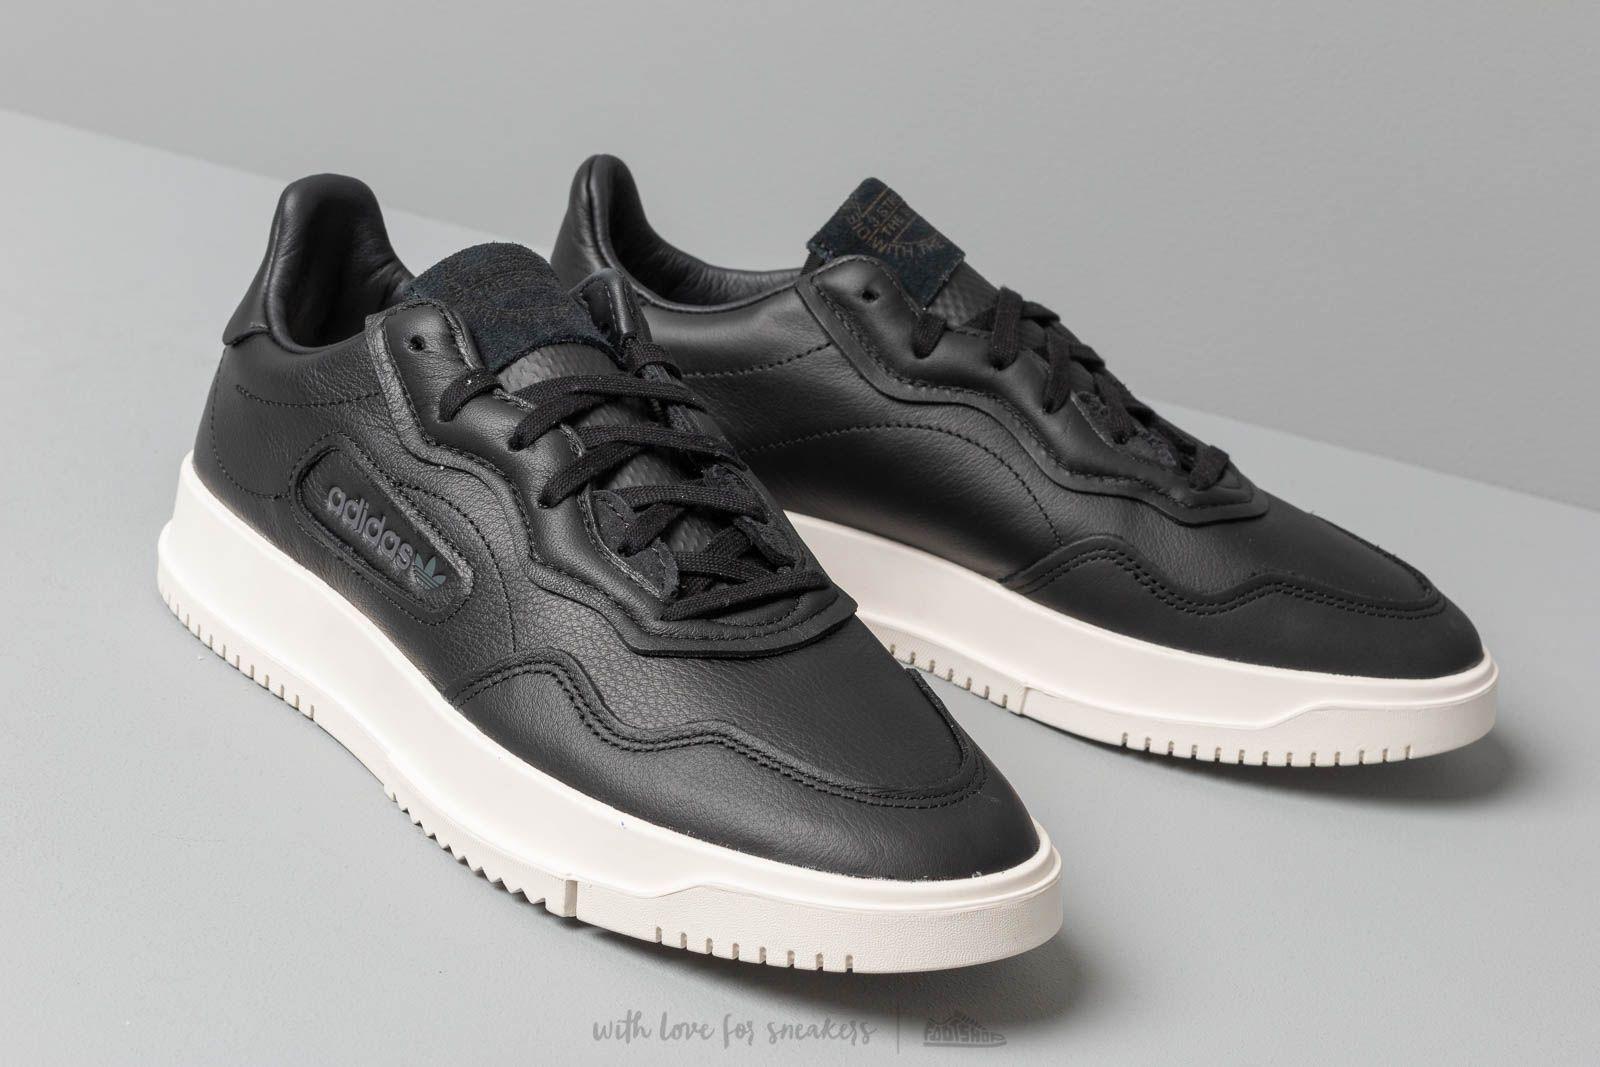 Paisaje Resonar girar  Men's shoes adidas SC Premiere Core Black/ Chalk White/ Cloud White |  Footshop